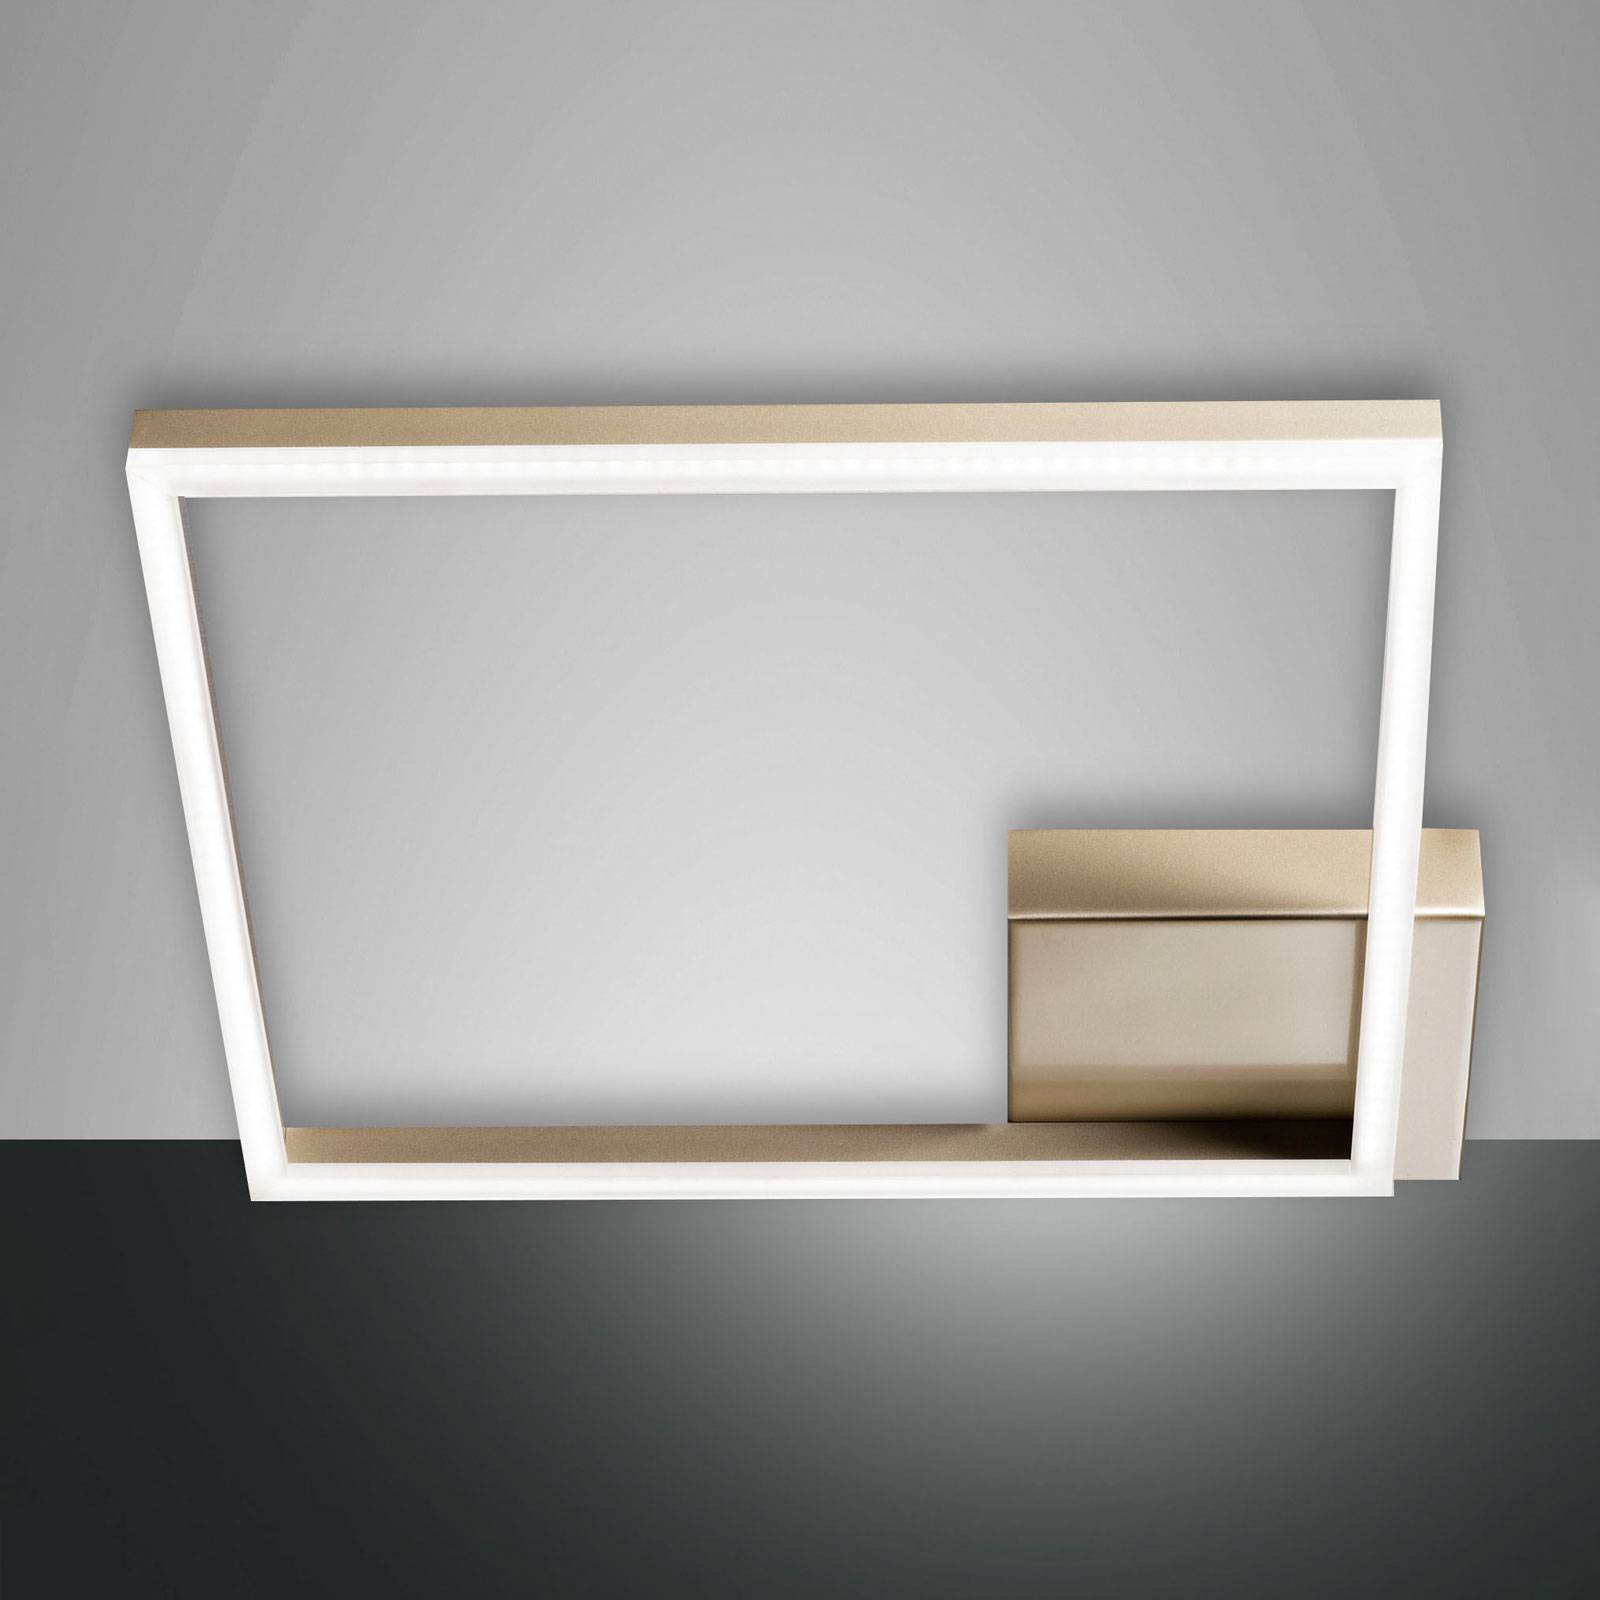 LED-Deckenleuchte Bard, 42x42cm, Mattgold-Finish